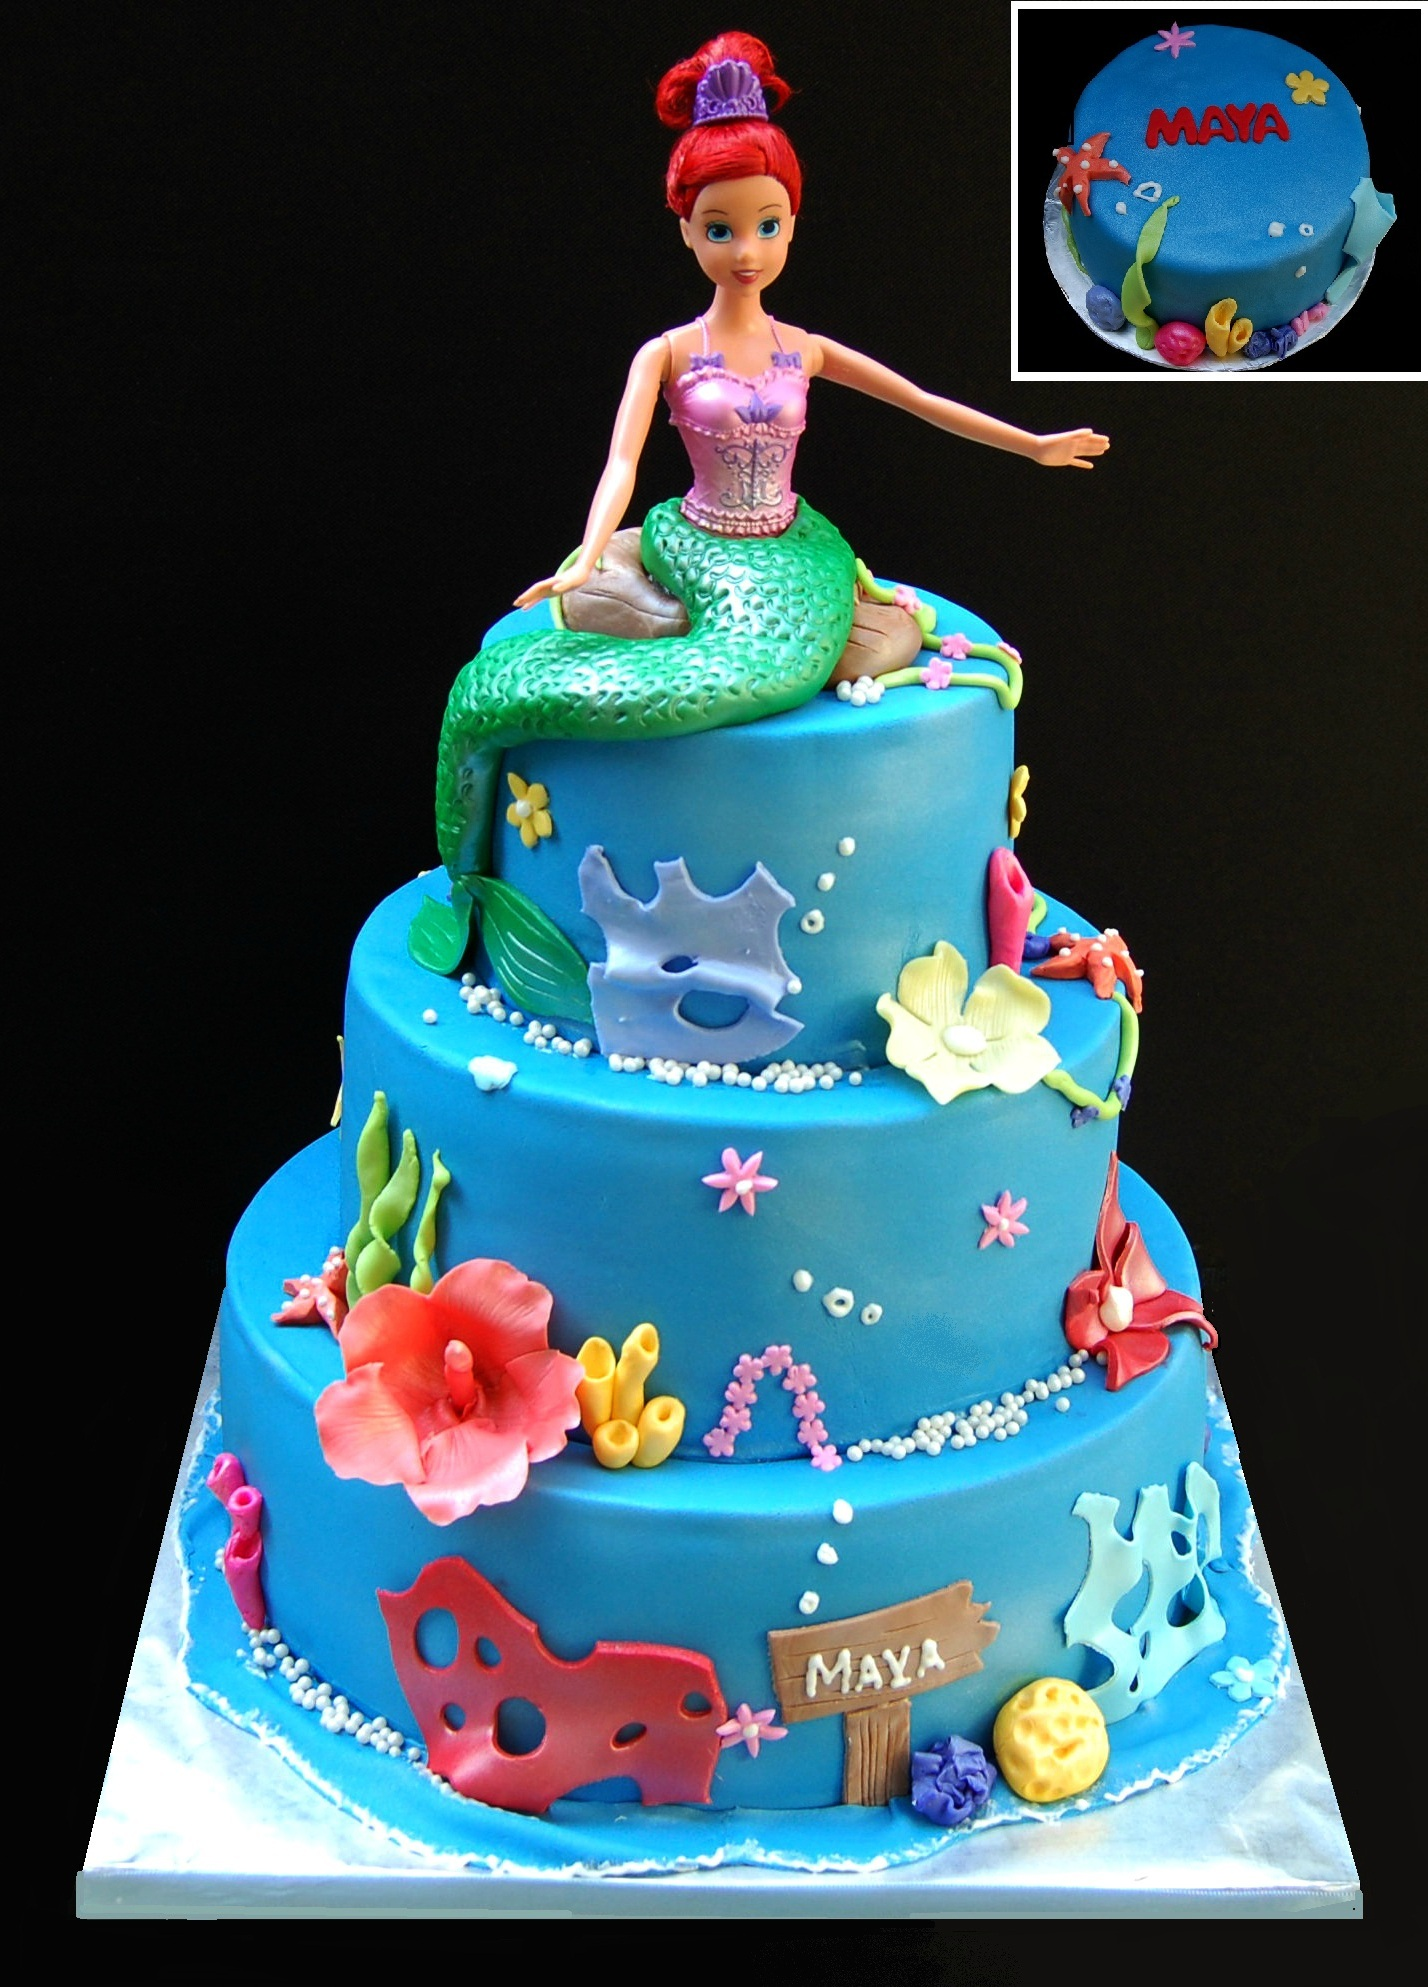 The Little Mermaid Cake Ideas